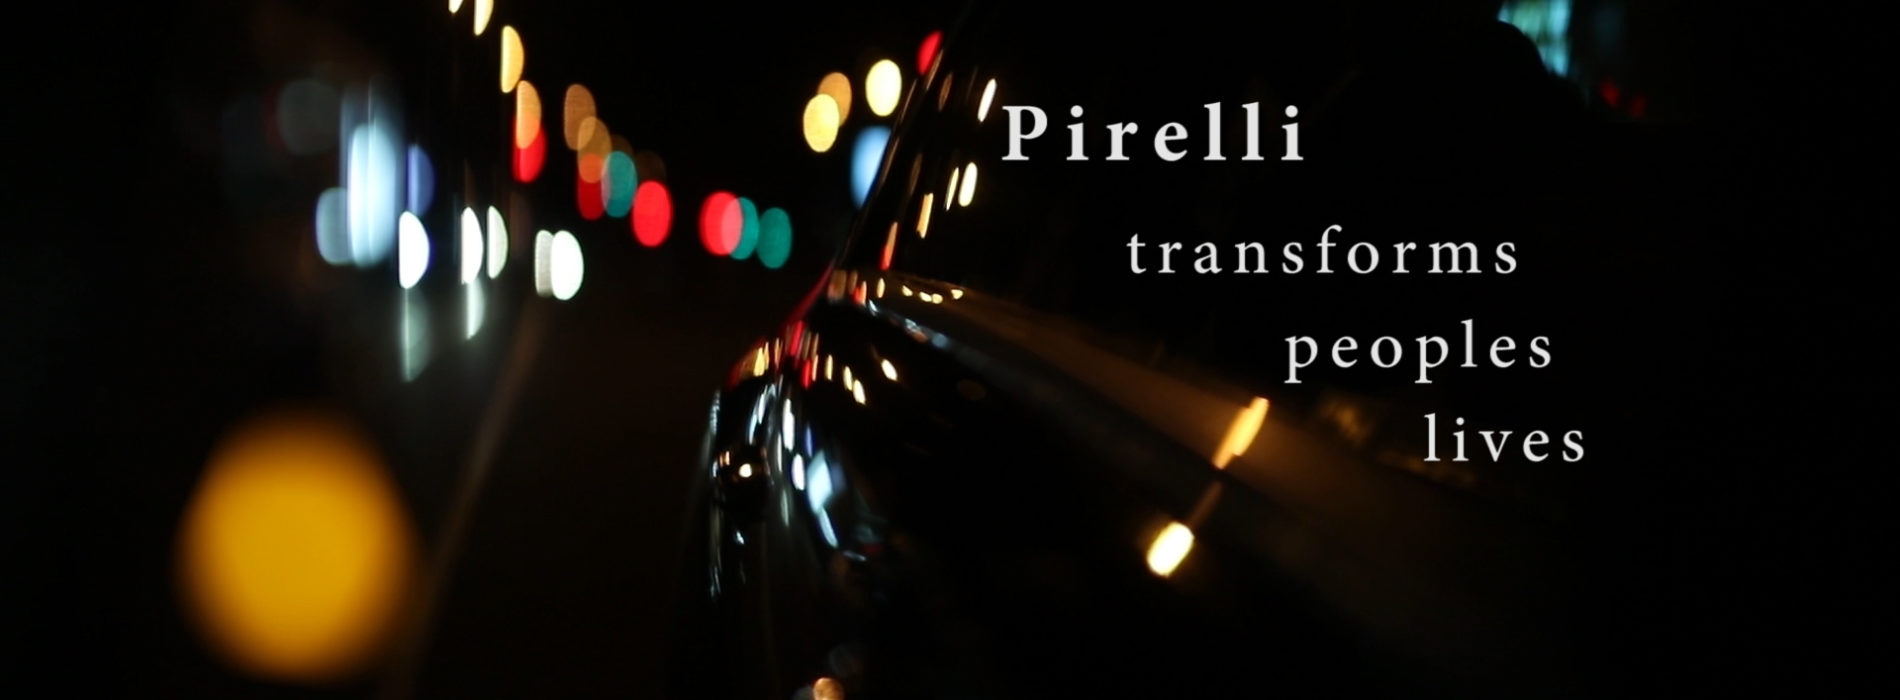 Pirelli- an iconic Brand of performance, longevity and innovation.